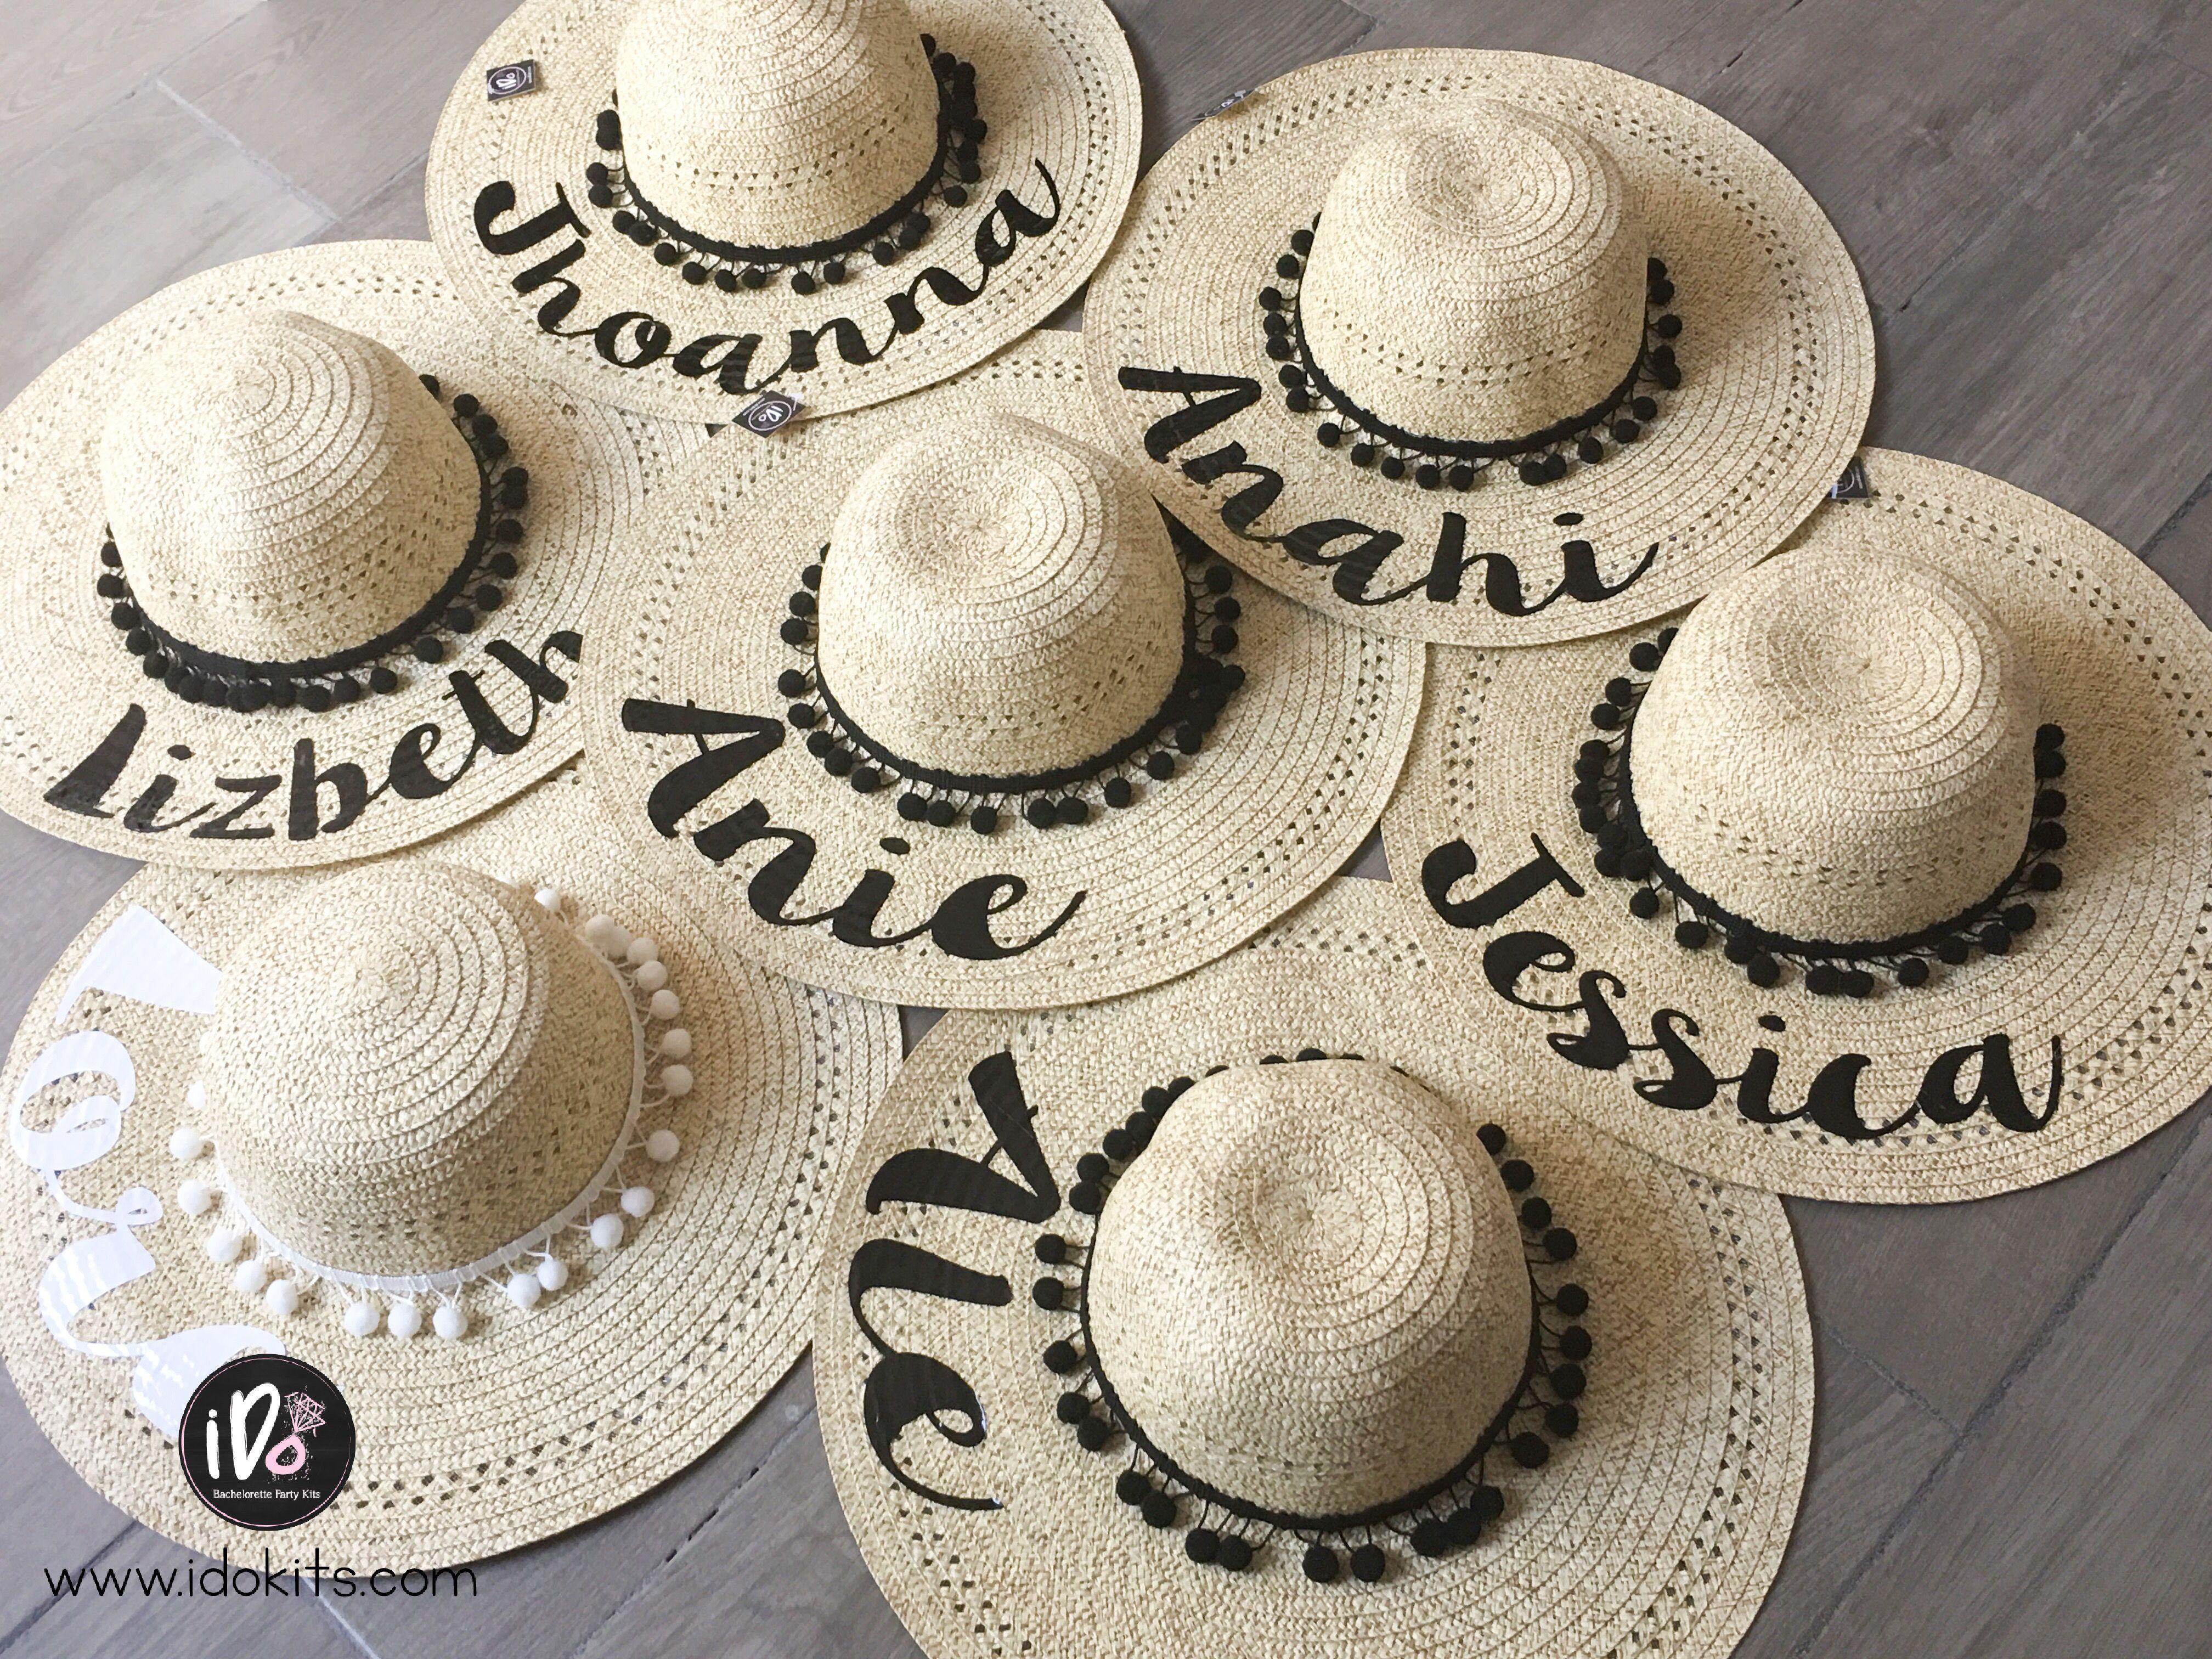 Sombreros personalizados para despedida de soltera www.idokits.com ... ab38b43c447